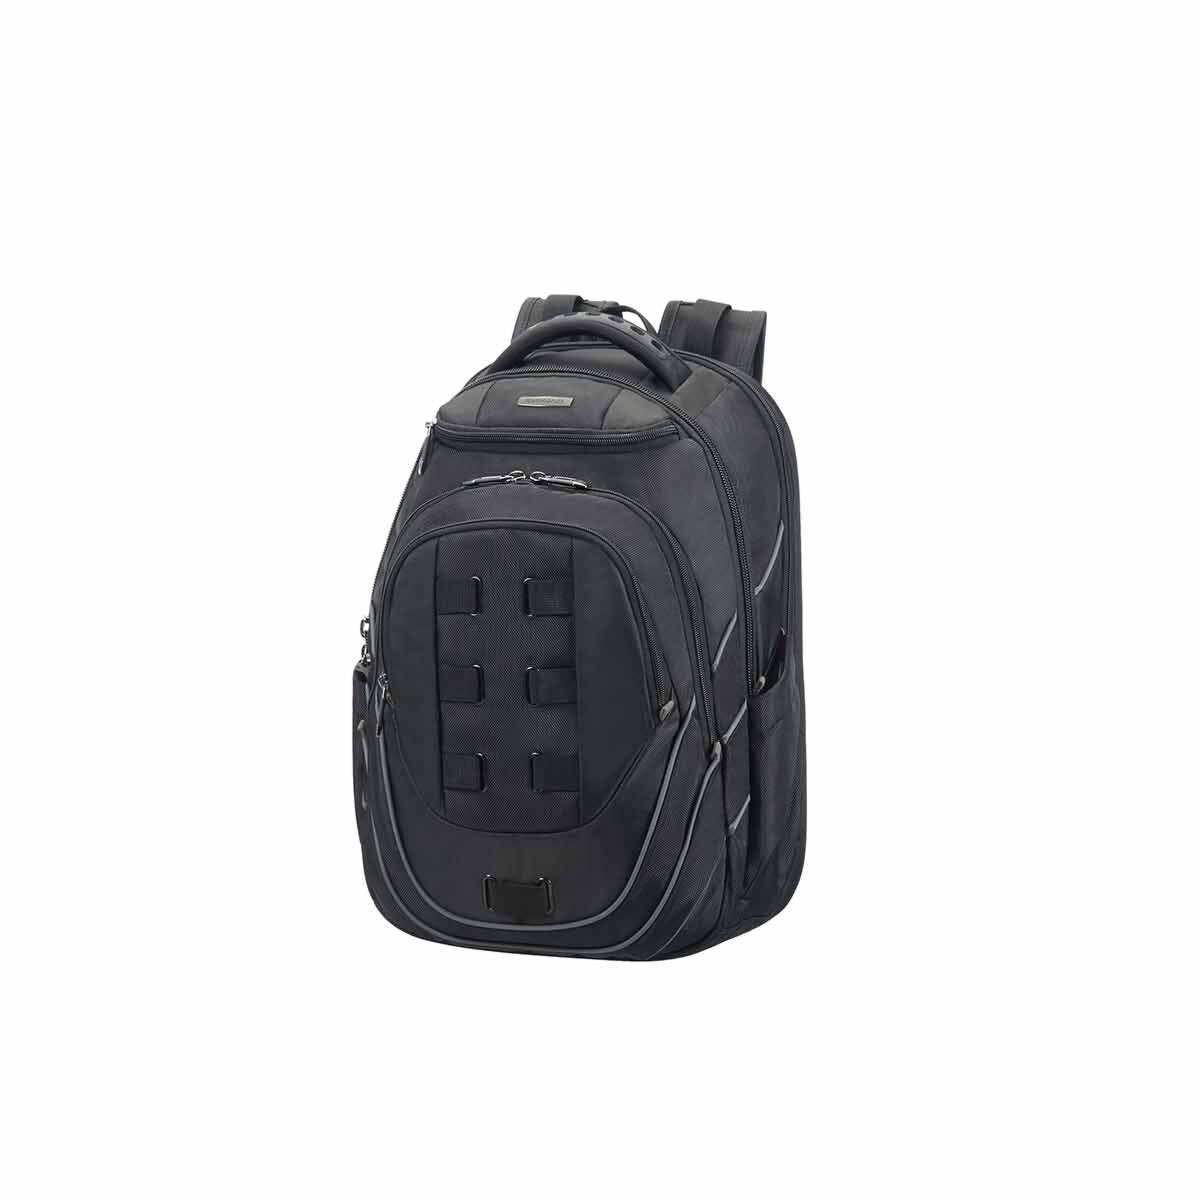 Samsonite Leviathan Laptop Backpack 17.3 Inch Black/Grey